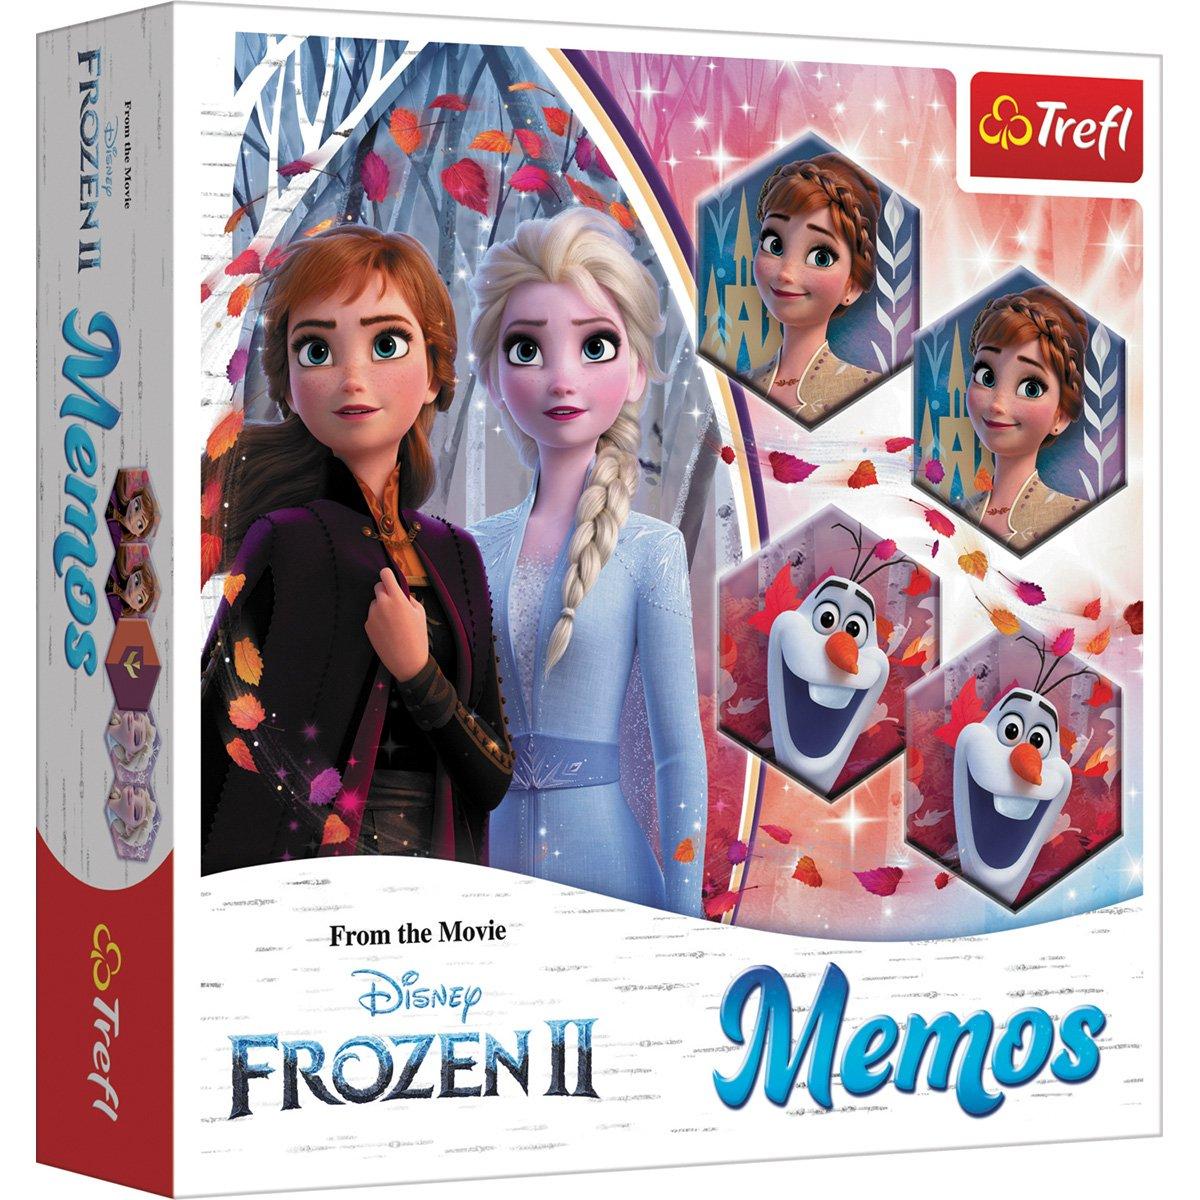 Joc de societate Trefl, Disney Frozen 2, Memos